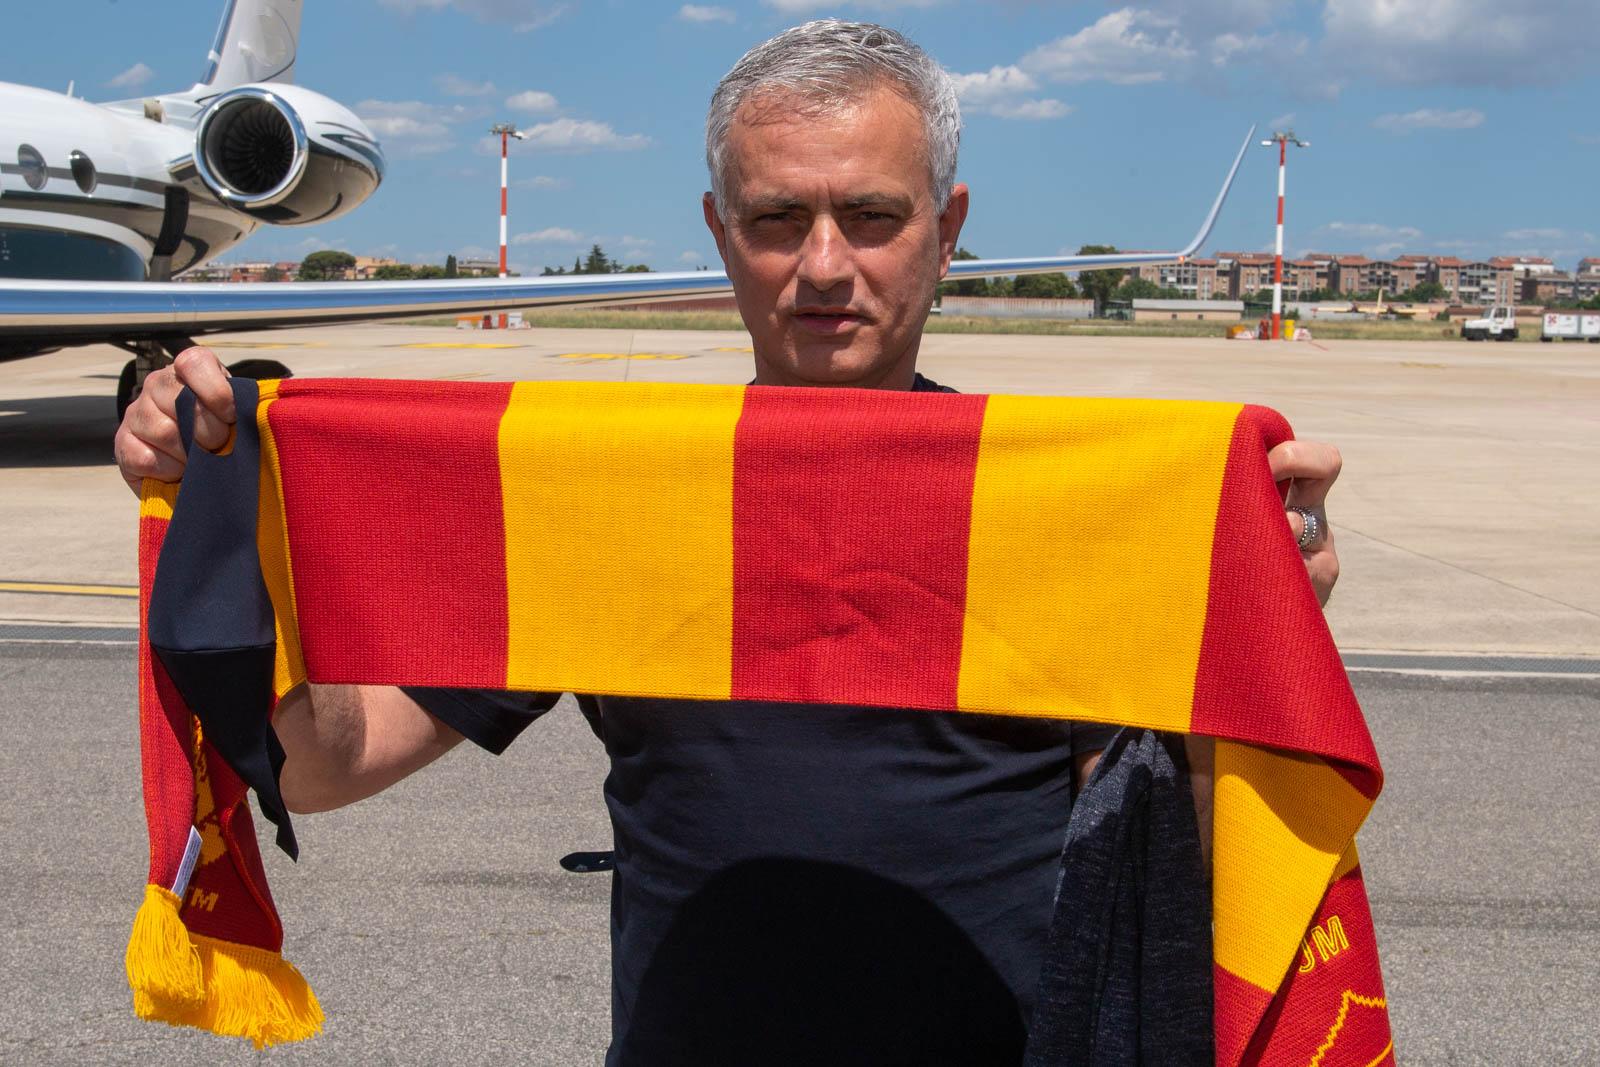 Mourinho terbang ke Roma pada 4 Juli untuk memulai pekerjaan baru di AS Roma.  Foto: Twitter / AS Roma